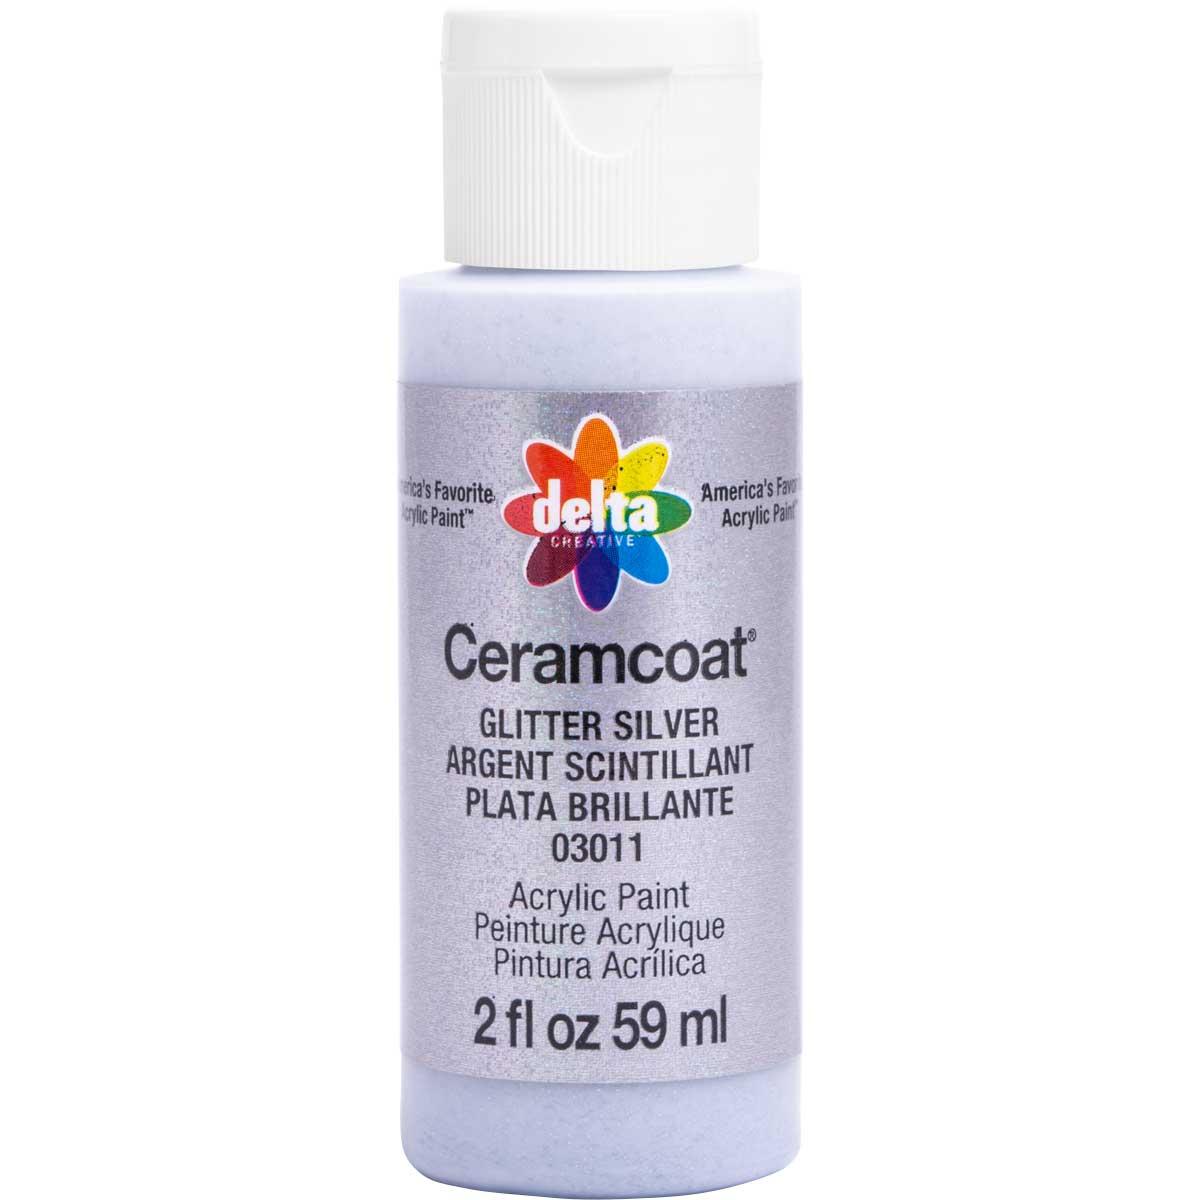 Delta Ceramcoat ® Acrylic Paint - Glitter Silver, 2 oz. - 03011